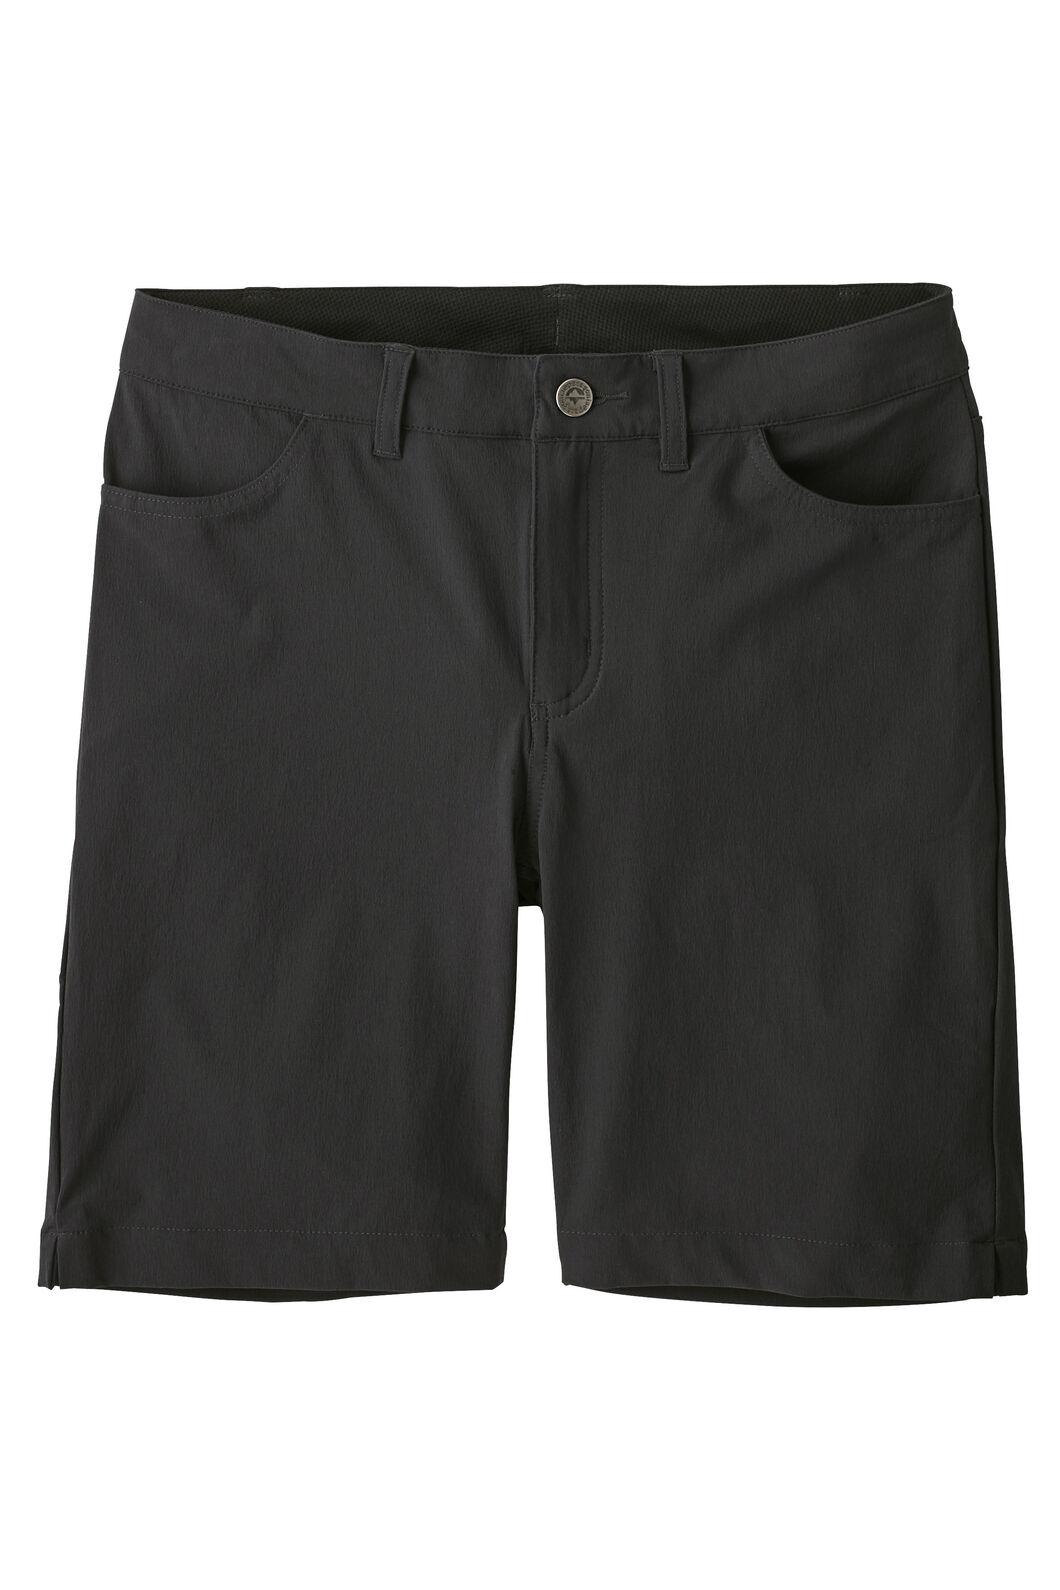 Patagonia W's Skyline Traveller Shorts, Black, hi-res